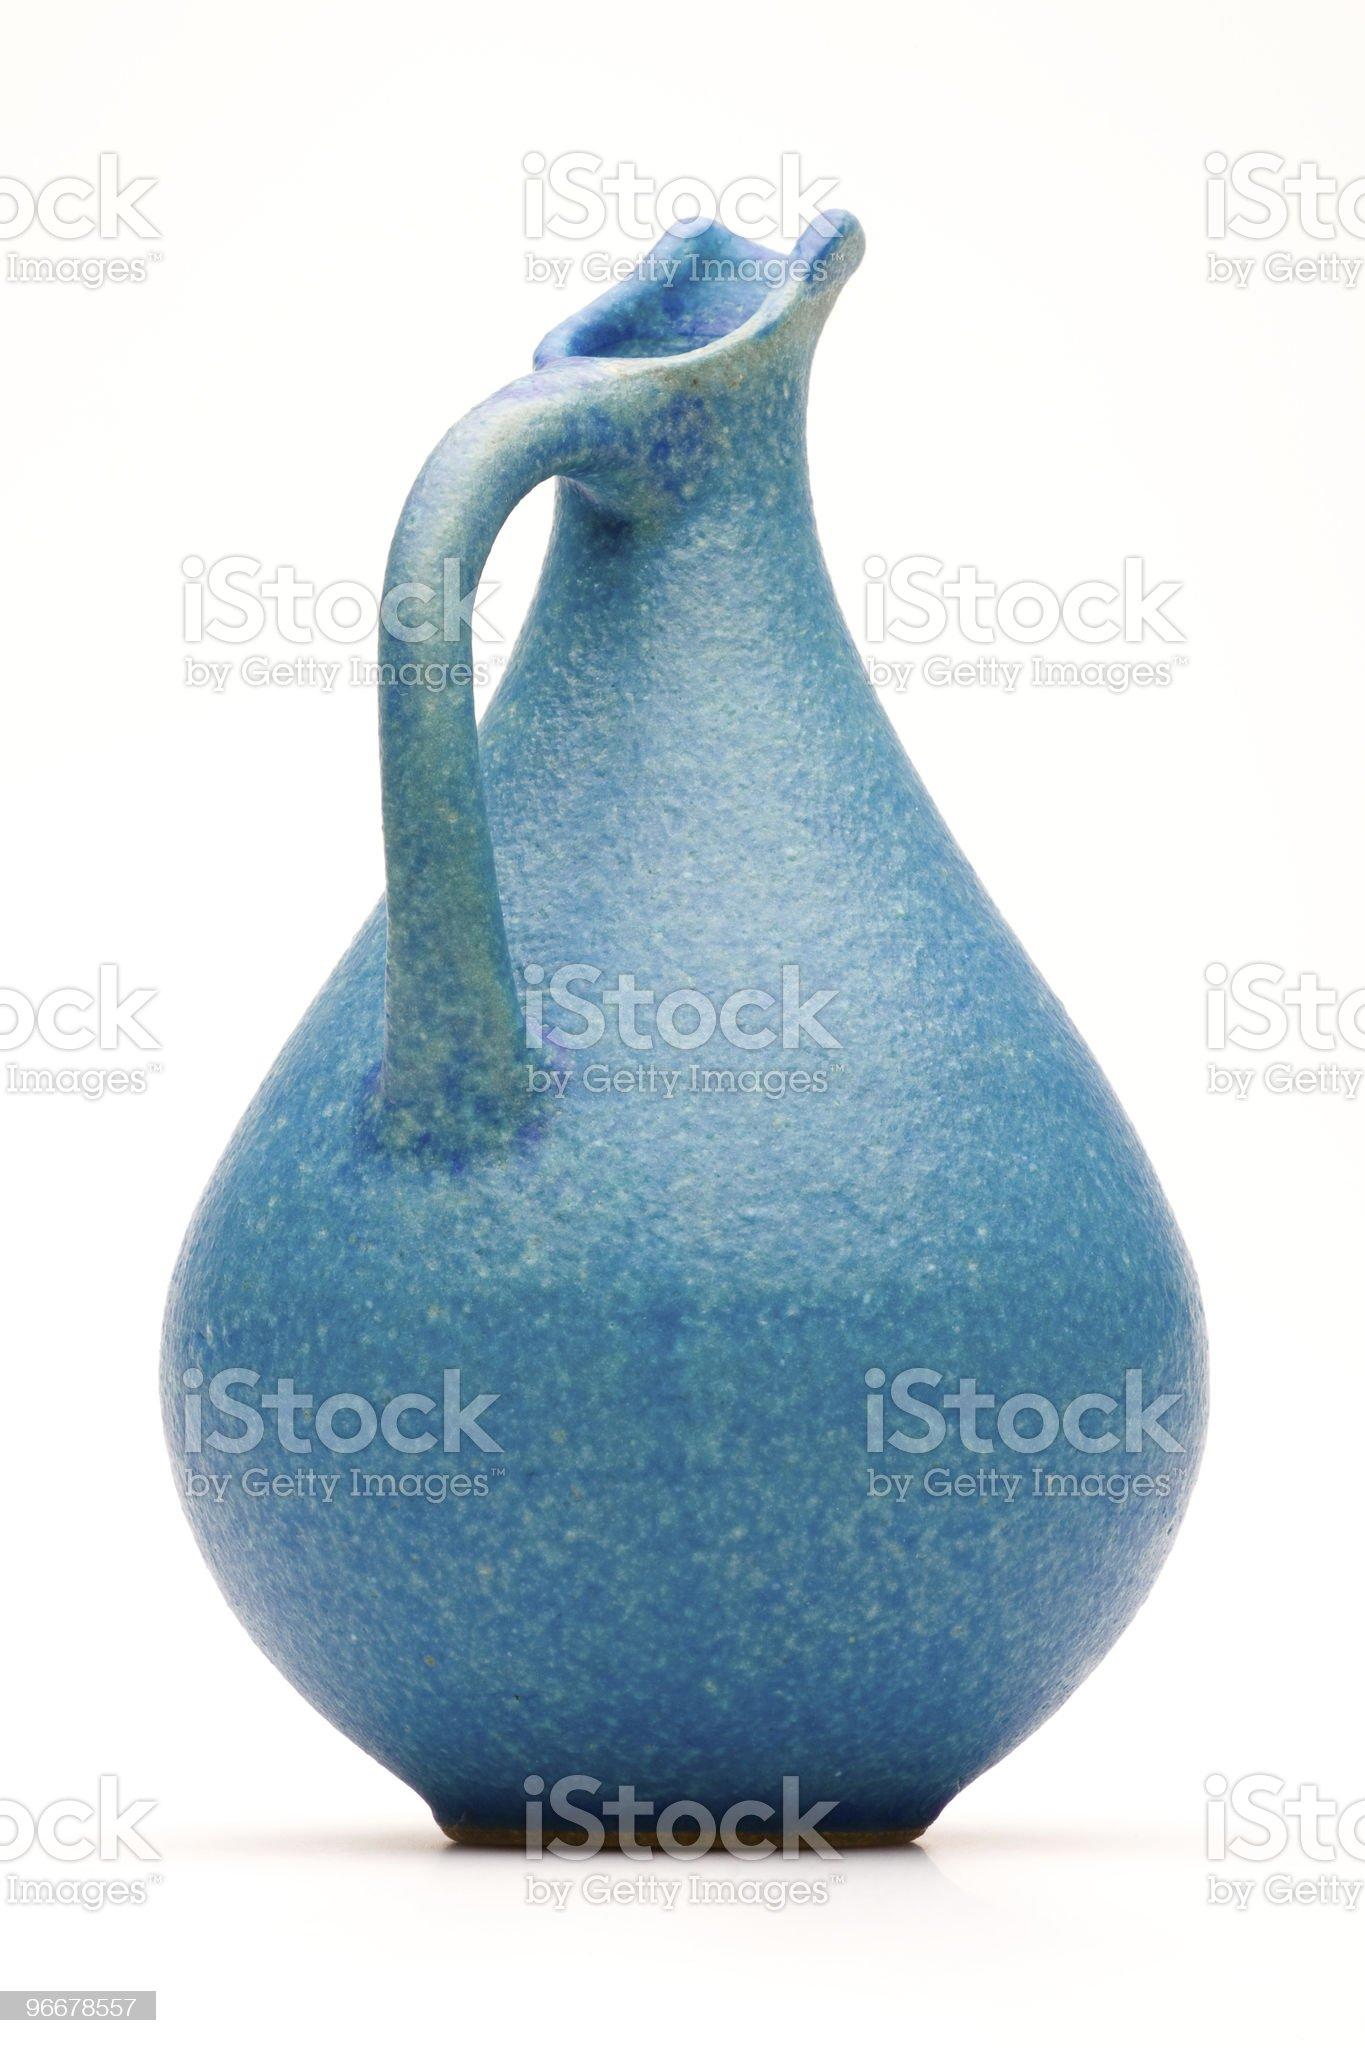 Blue Jug royalty-free stock photo